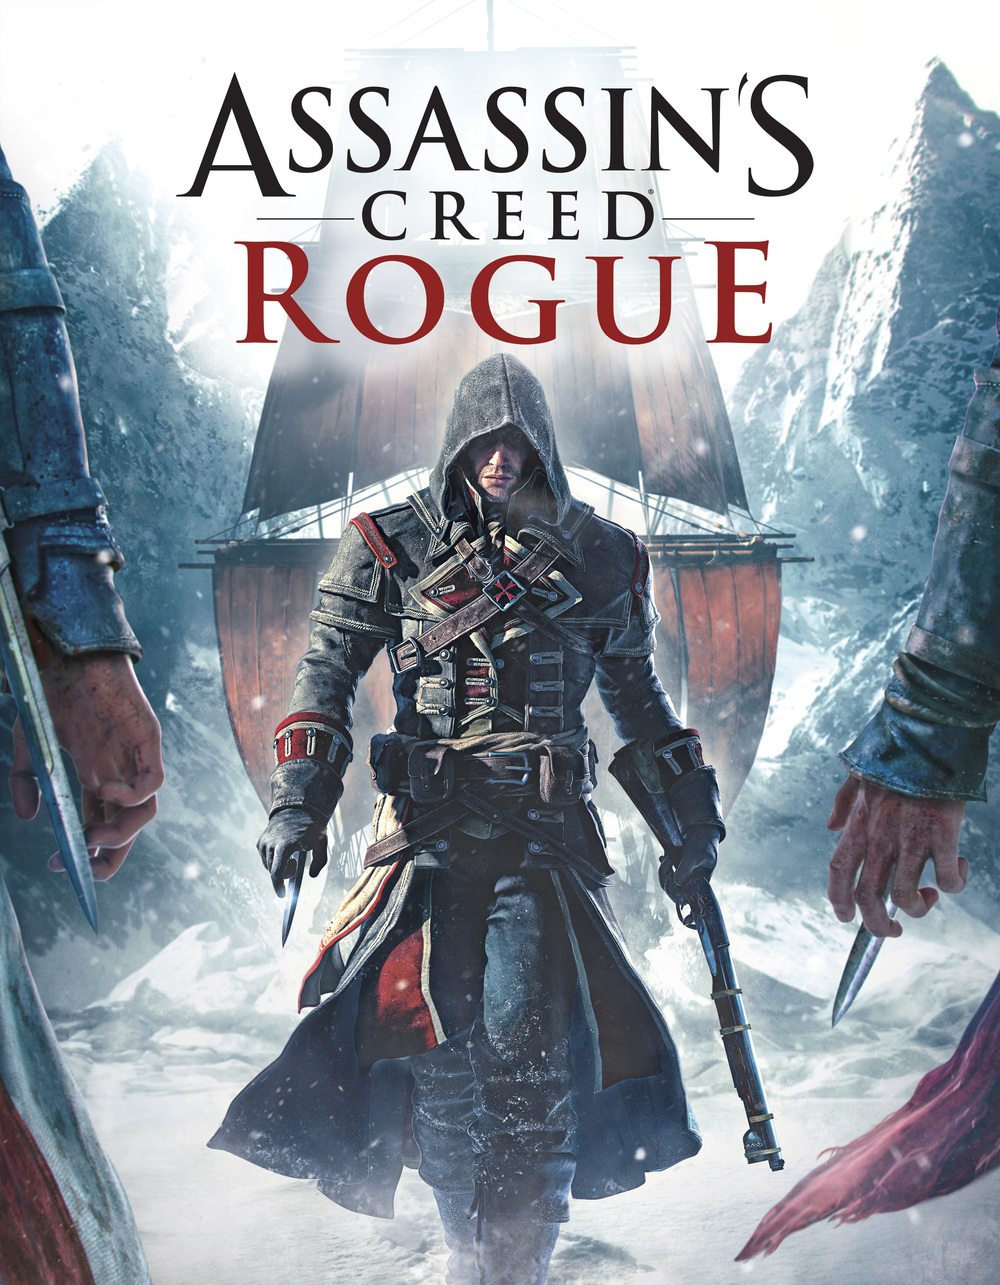 Assassins_Creed_Rogue_KEYART.JPG